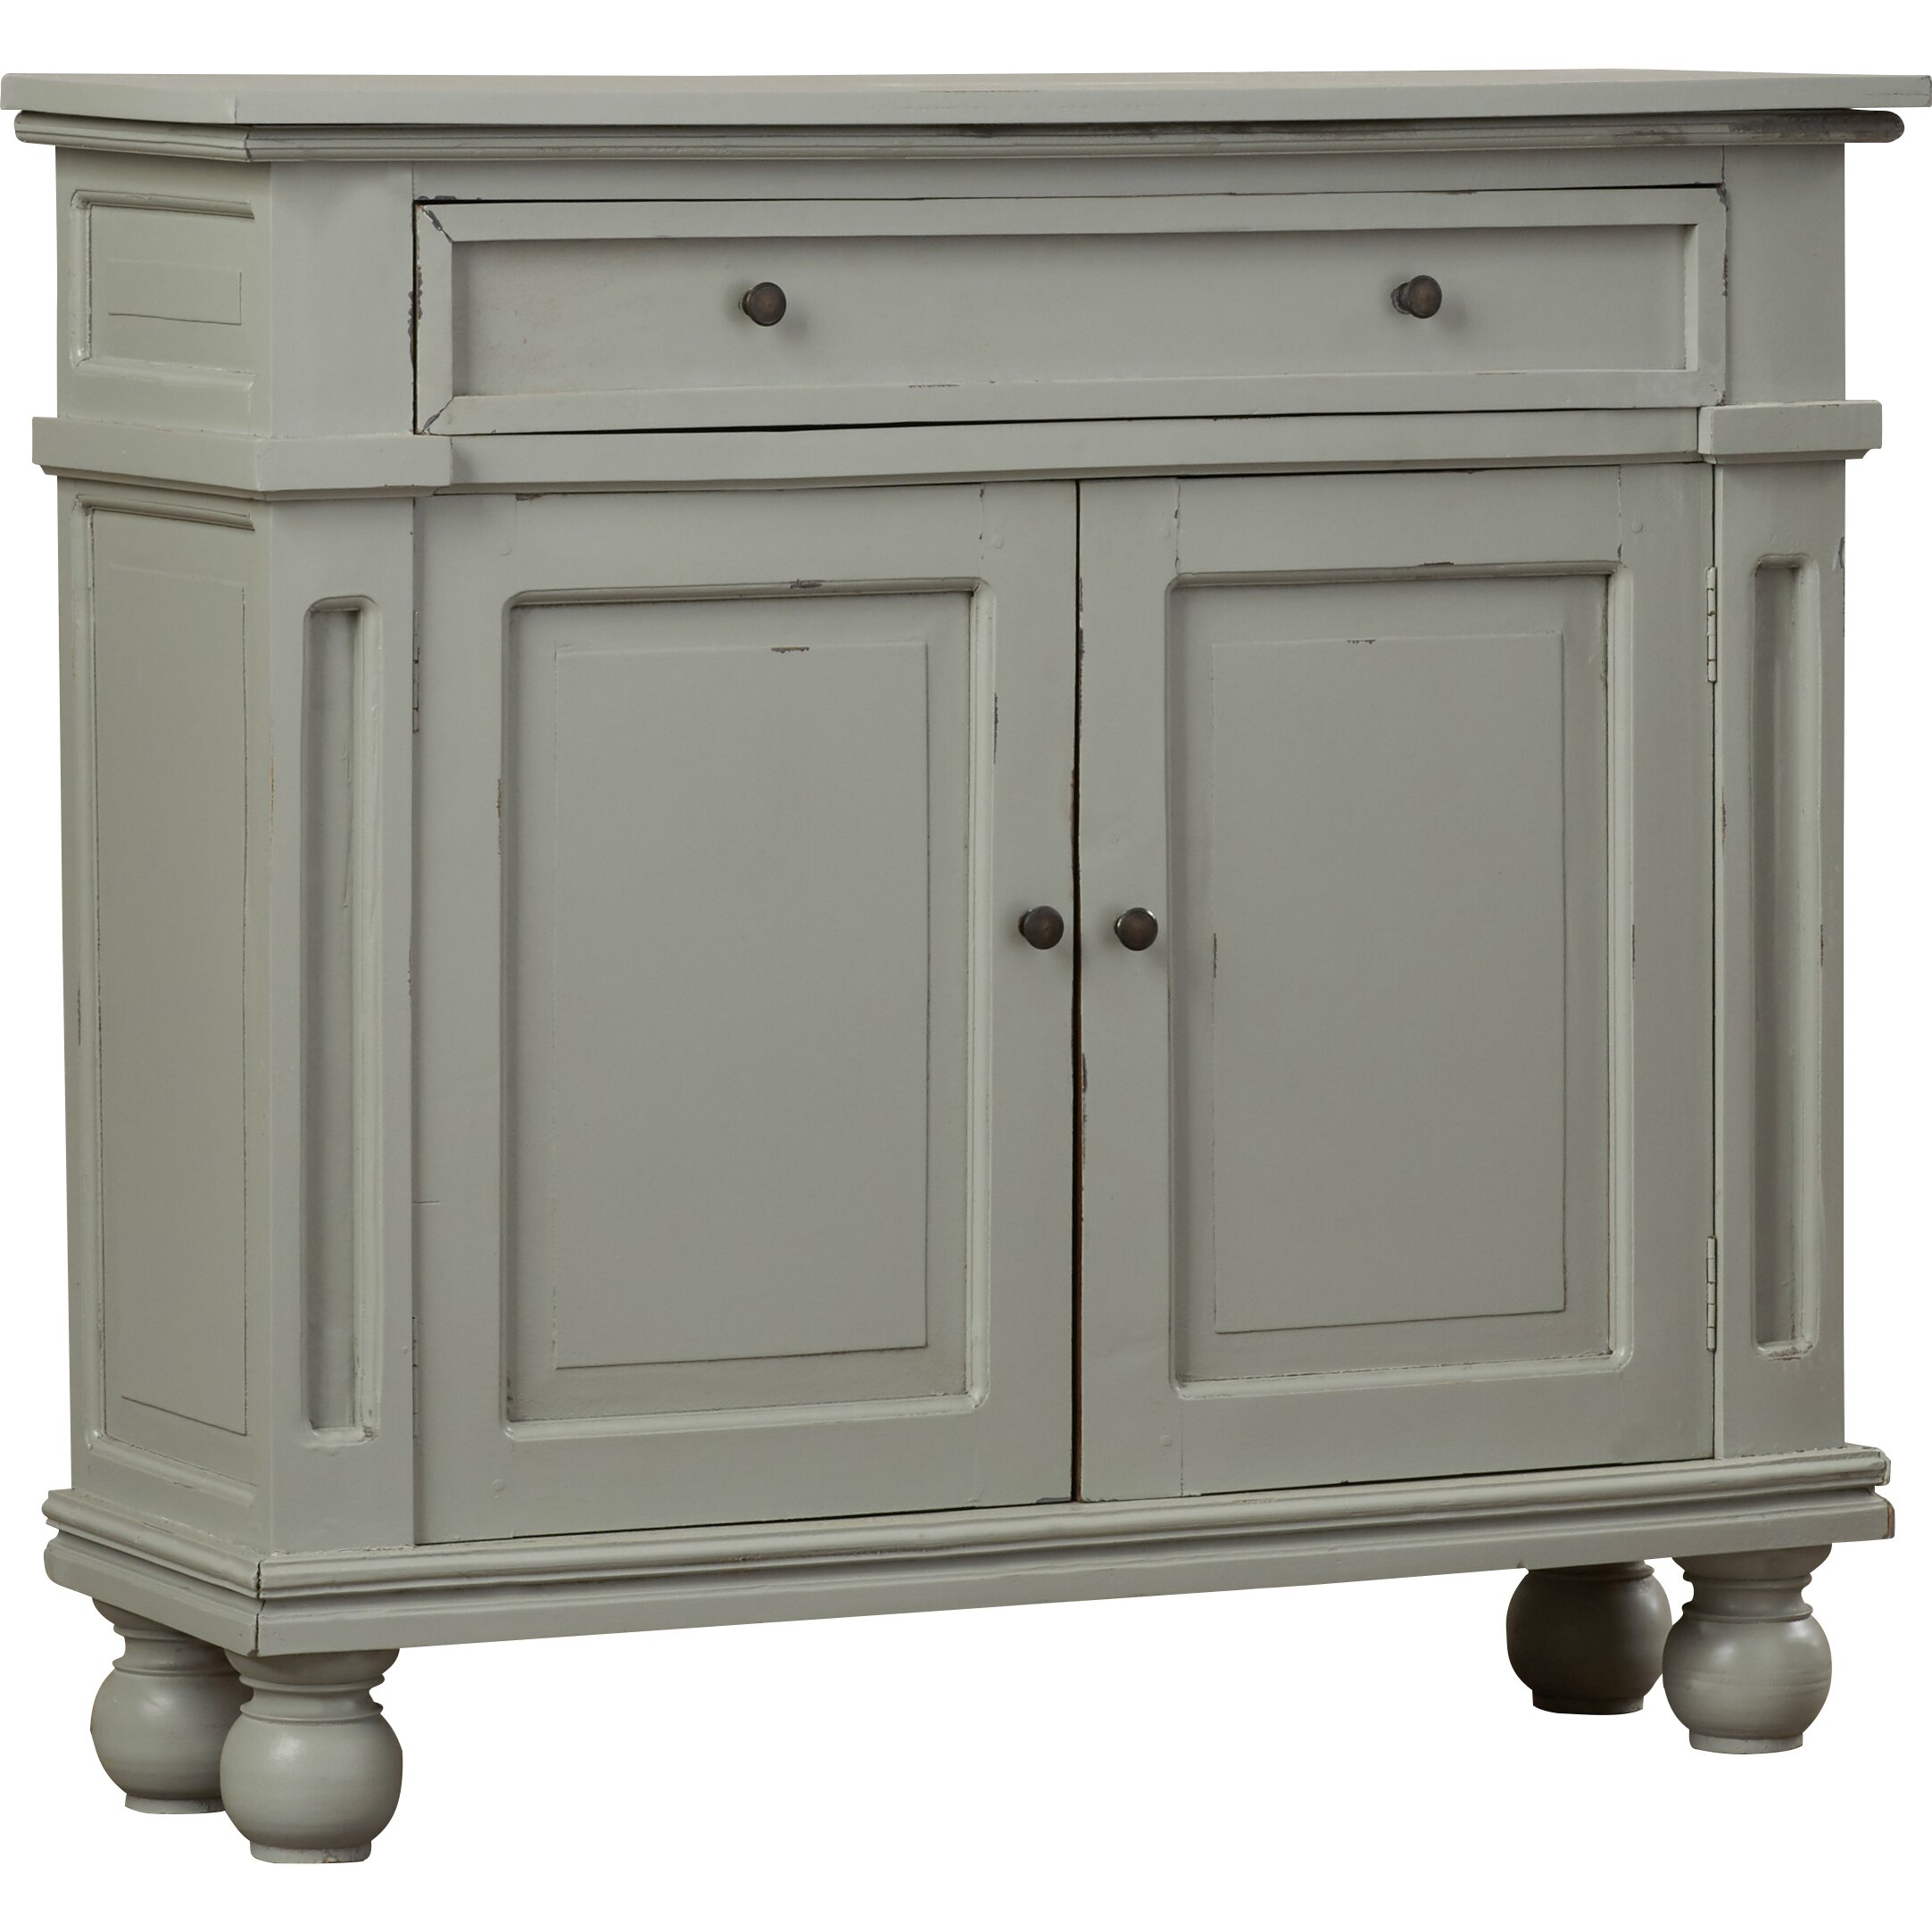 Beachcrest home marcy 2 door and 1 drawer cabinet for 1 drawer 2 door cabinet